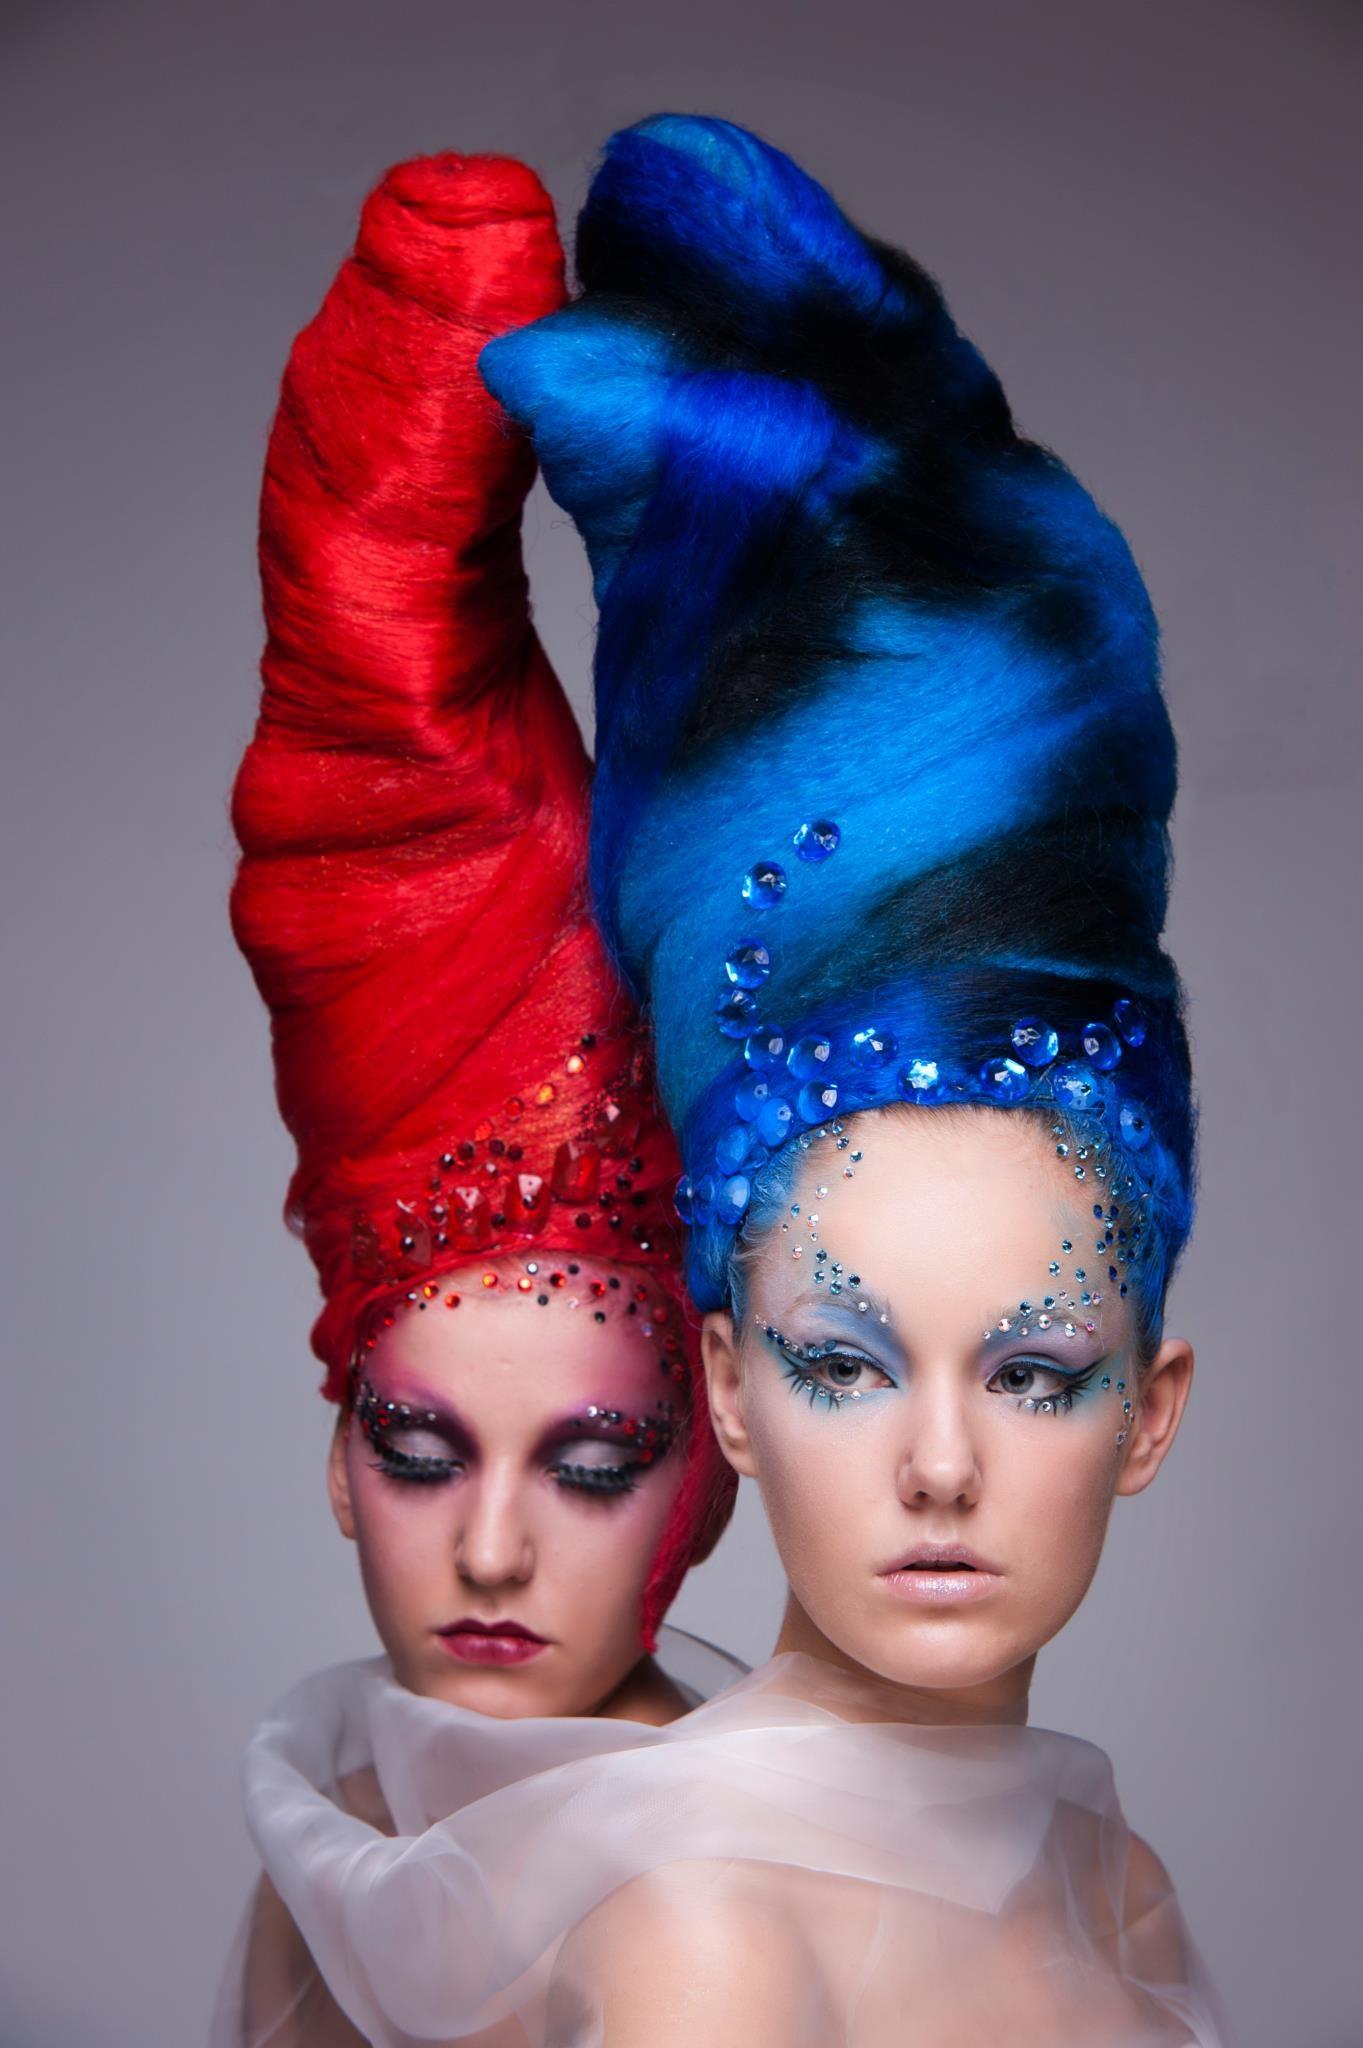 Wigs & Make-up